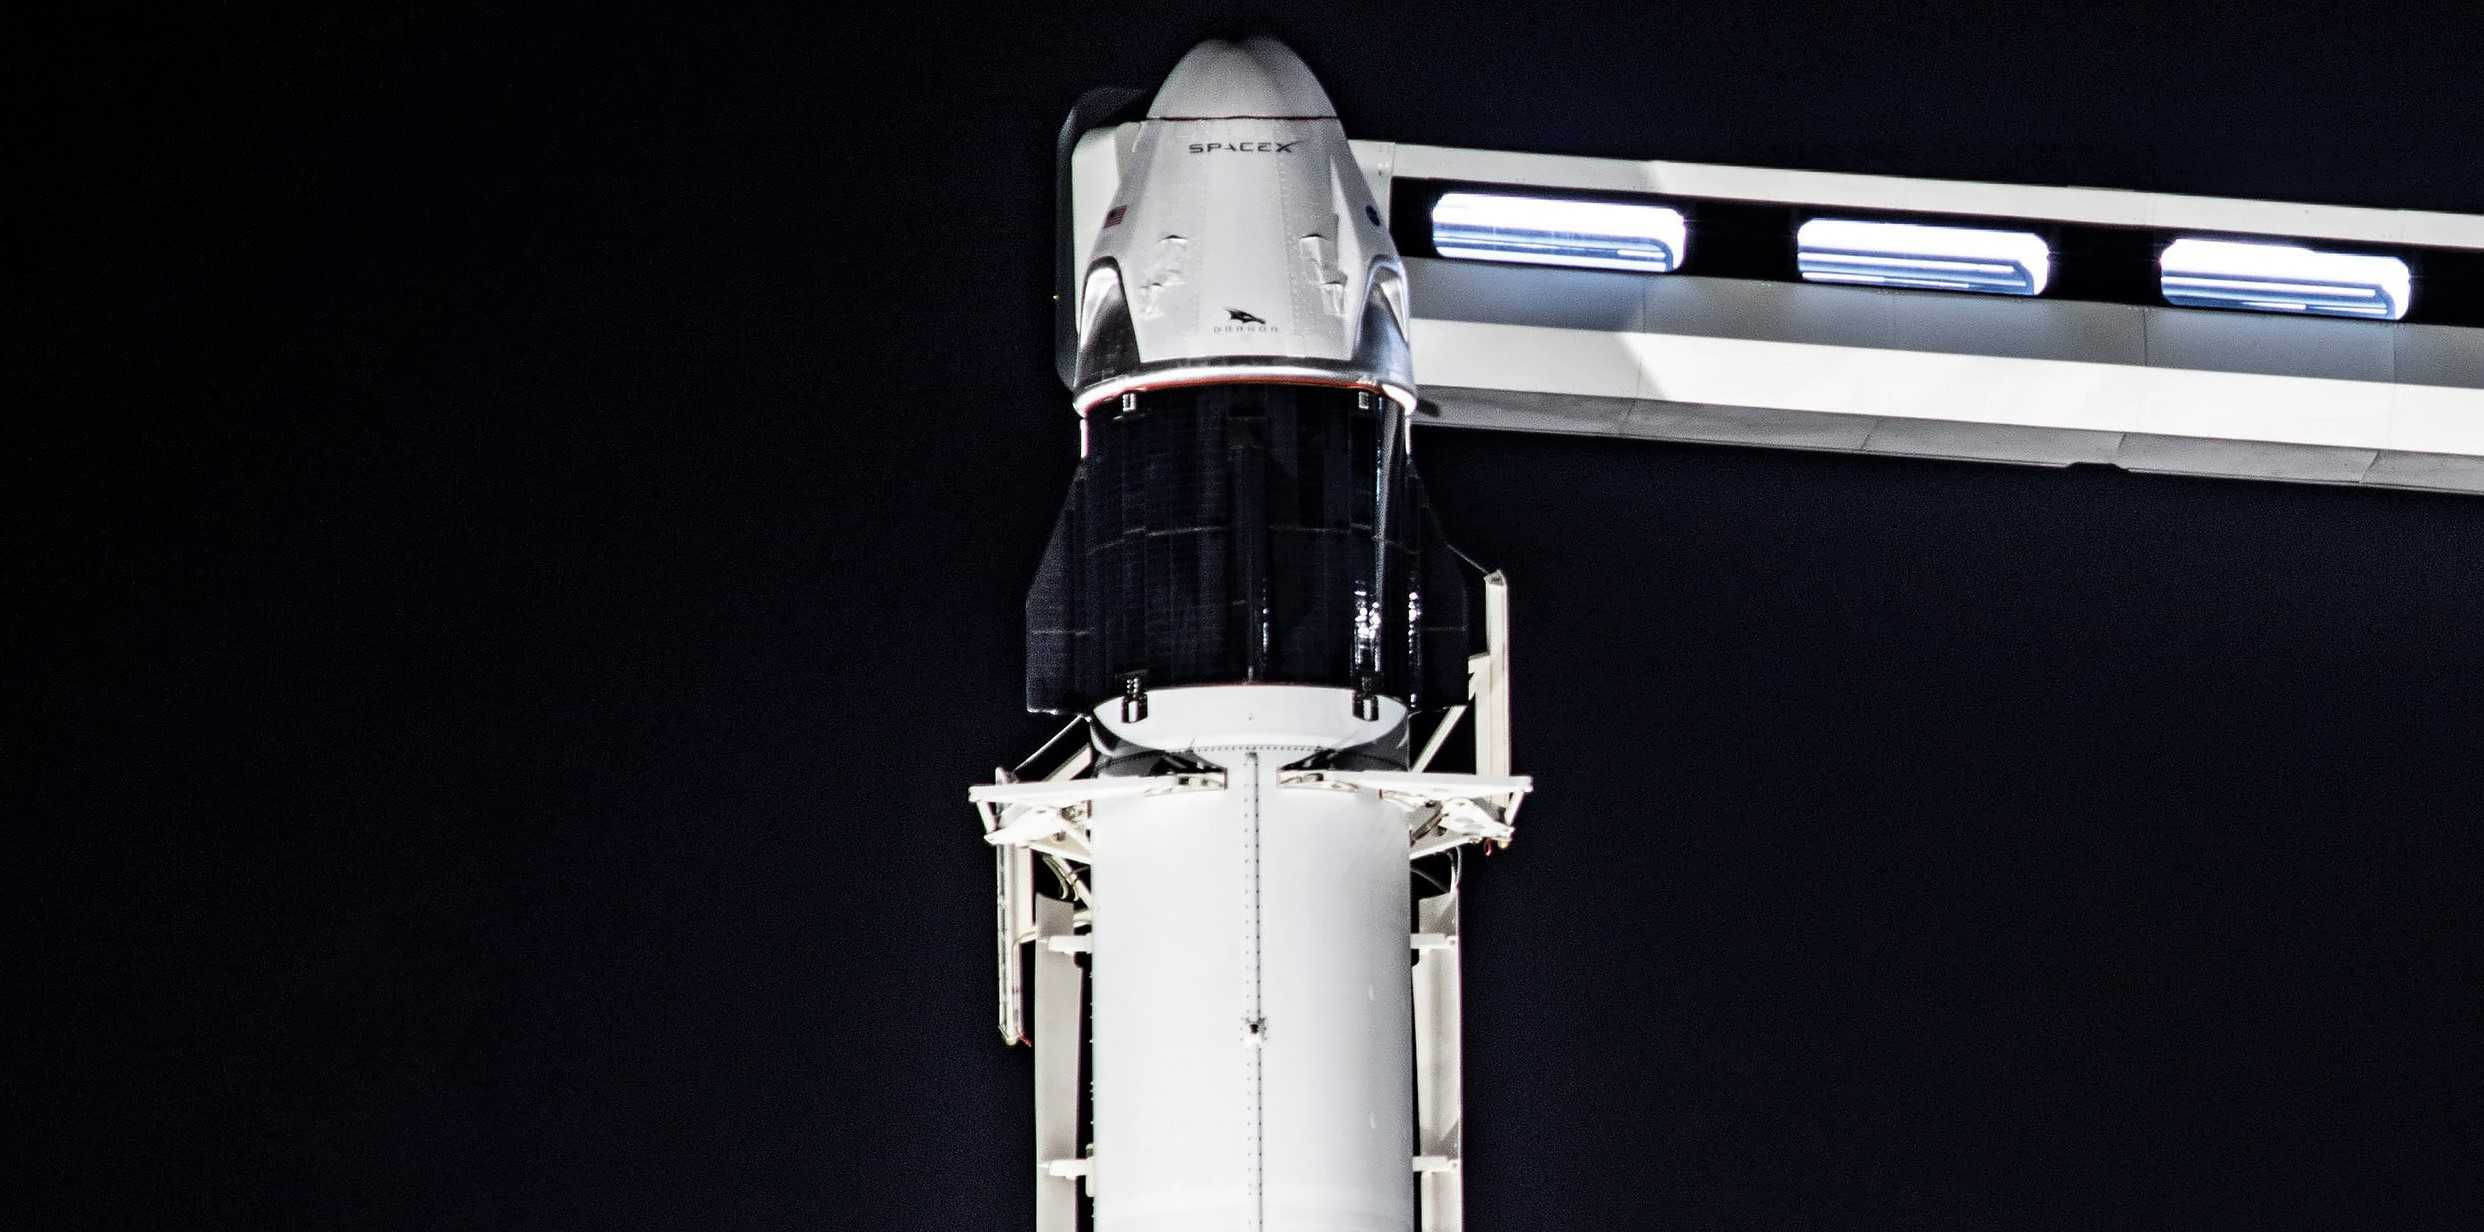 Crew Dragon C205 F9 B1046 IFA 39A vertical 011620 (SpaceX) 2 crop 2 (c)